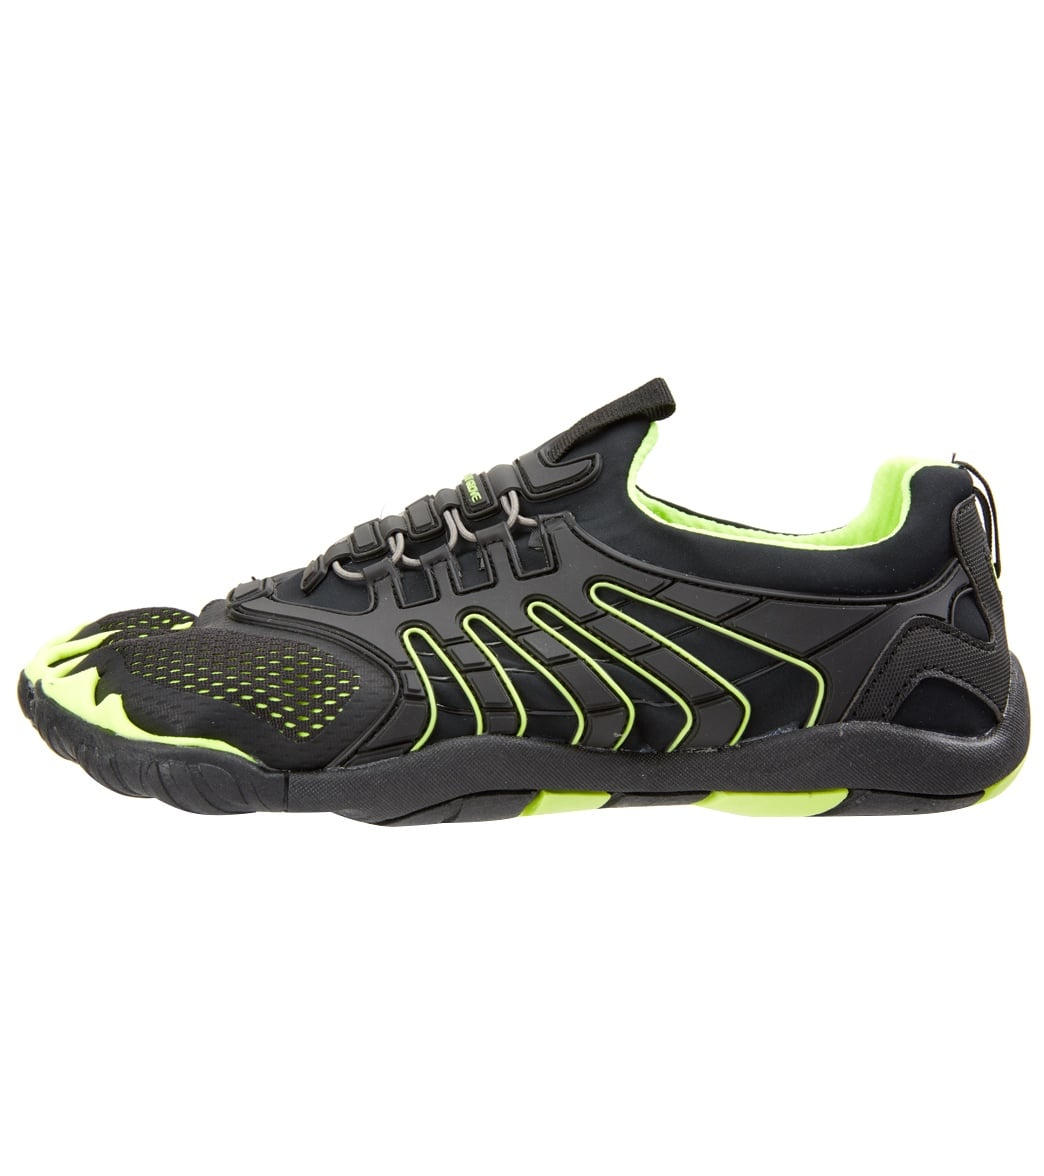 050da4ec19eb Body Glove Men s 3T Barefoot Hero Water Shoe at SwimOutlet.com ...